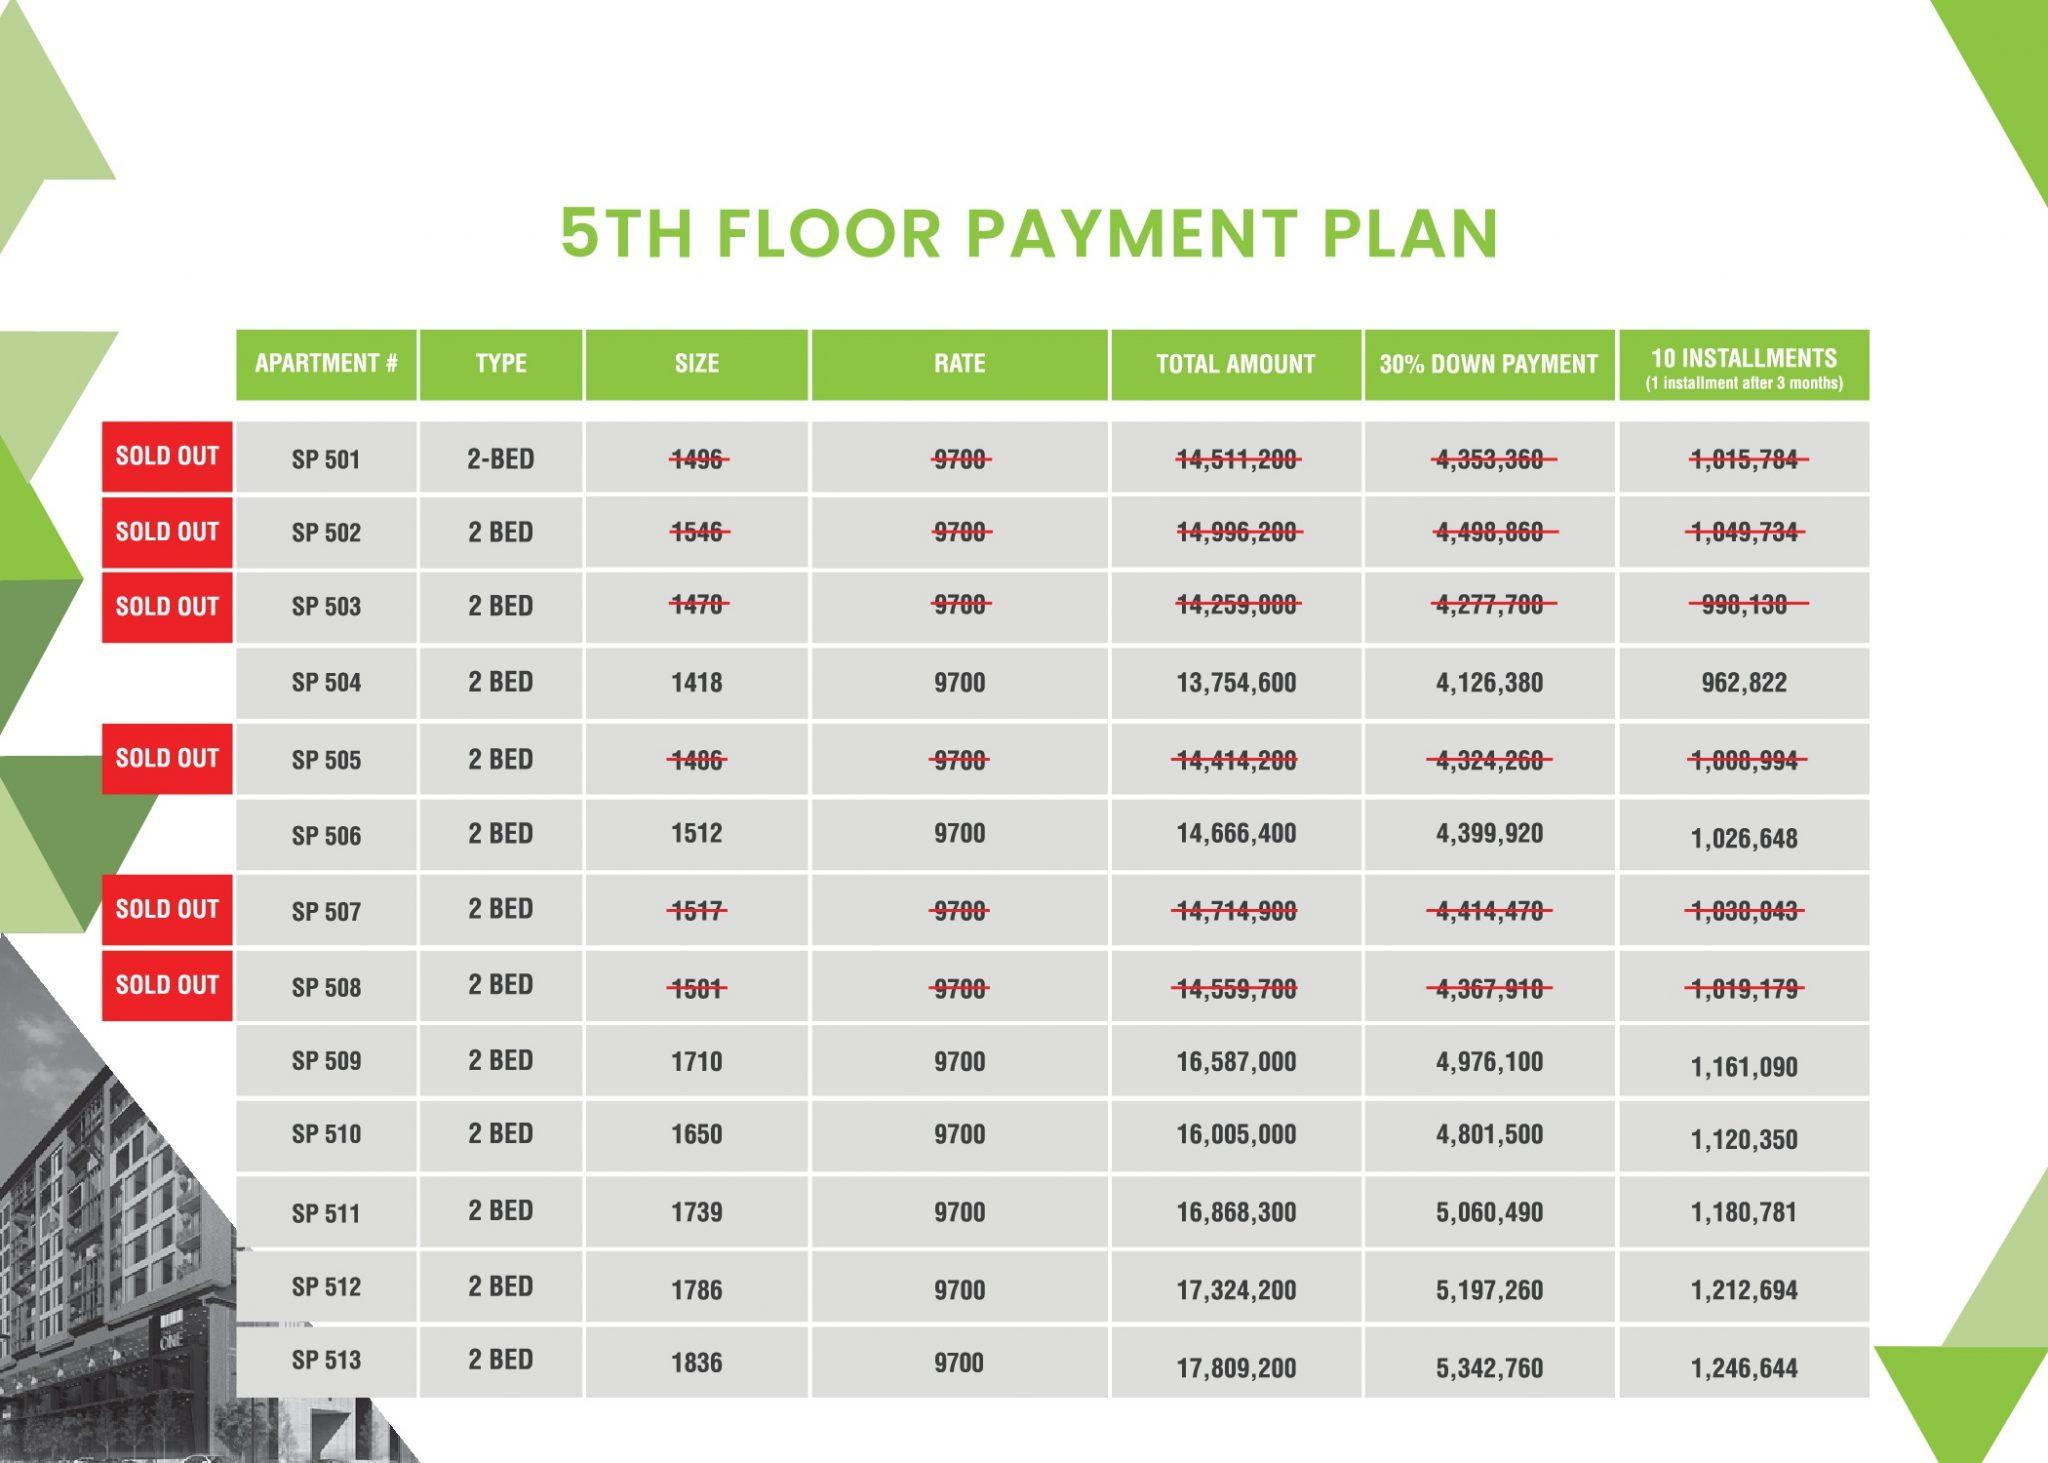 5th floor payment plan